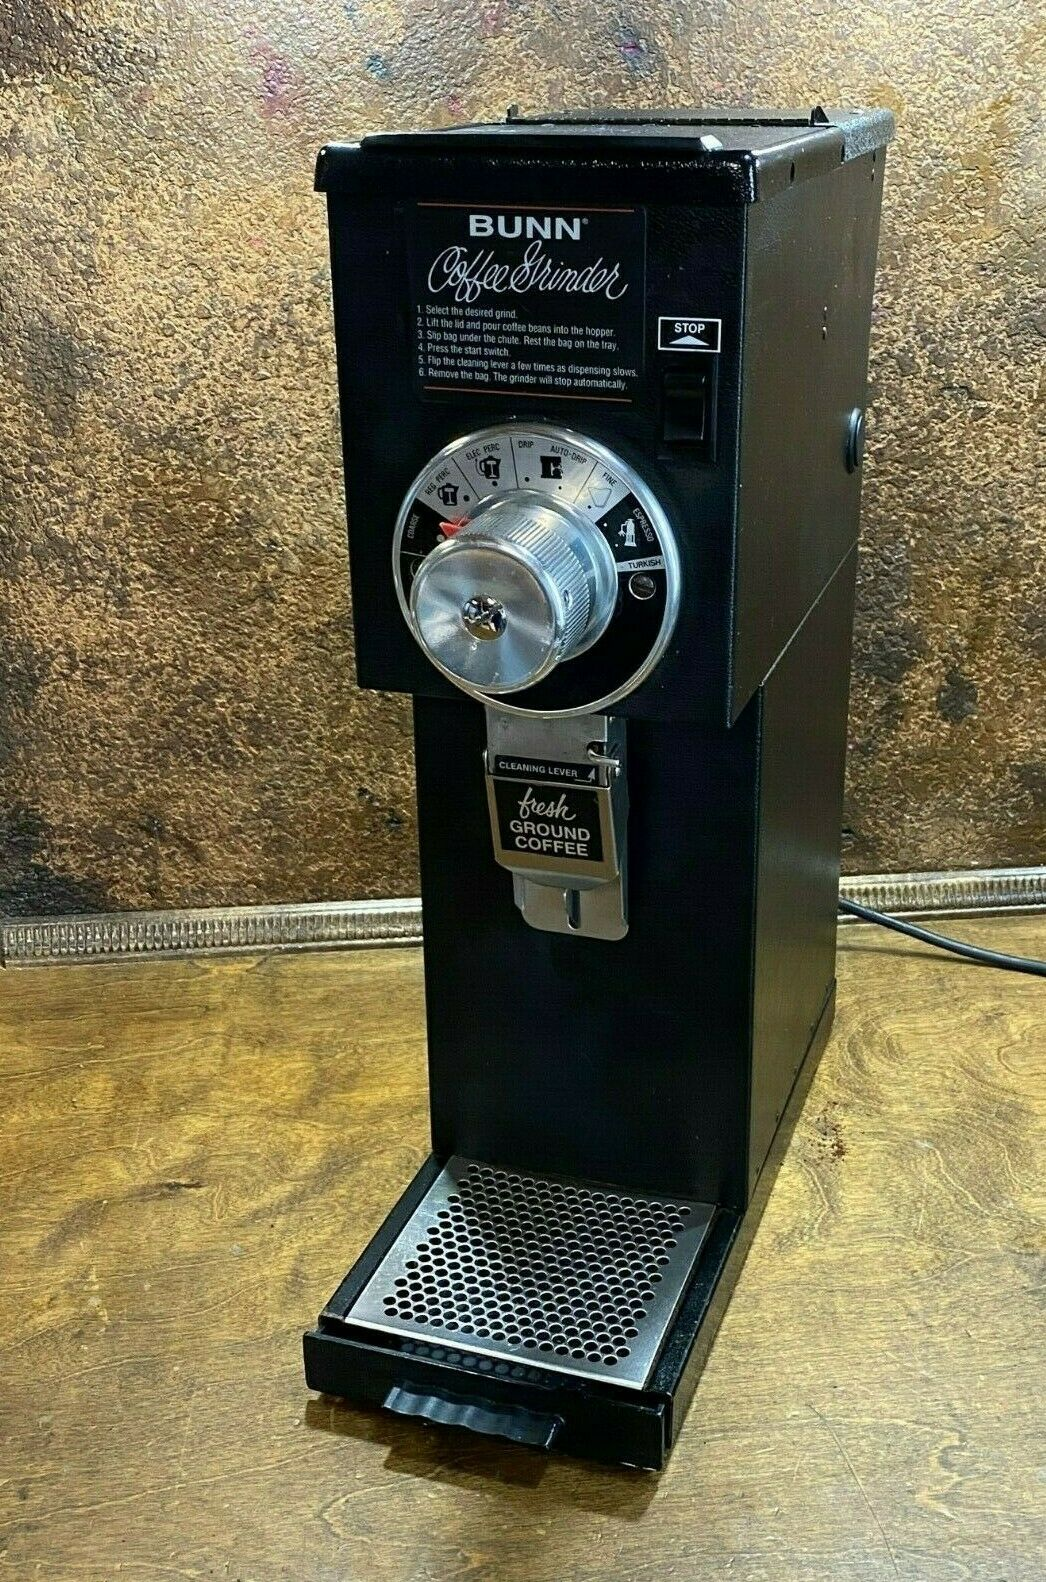 Bunn Coffee Grinder Burr Set G1 G2 G3 GVH Series 05861.1002